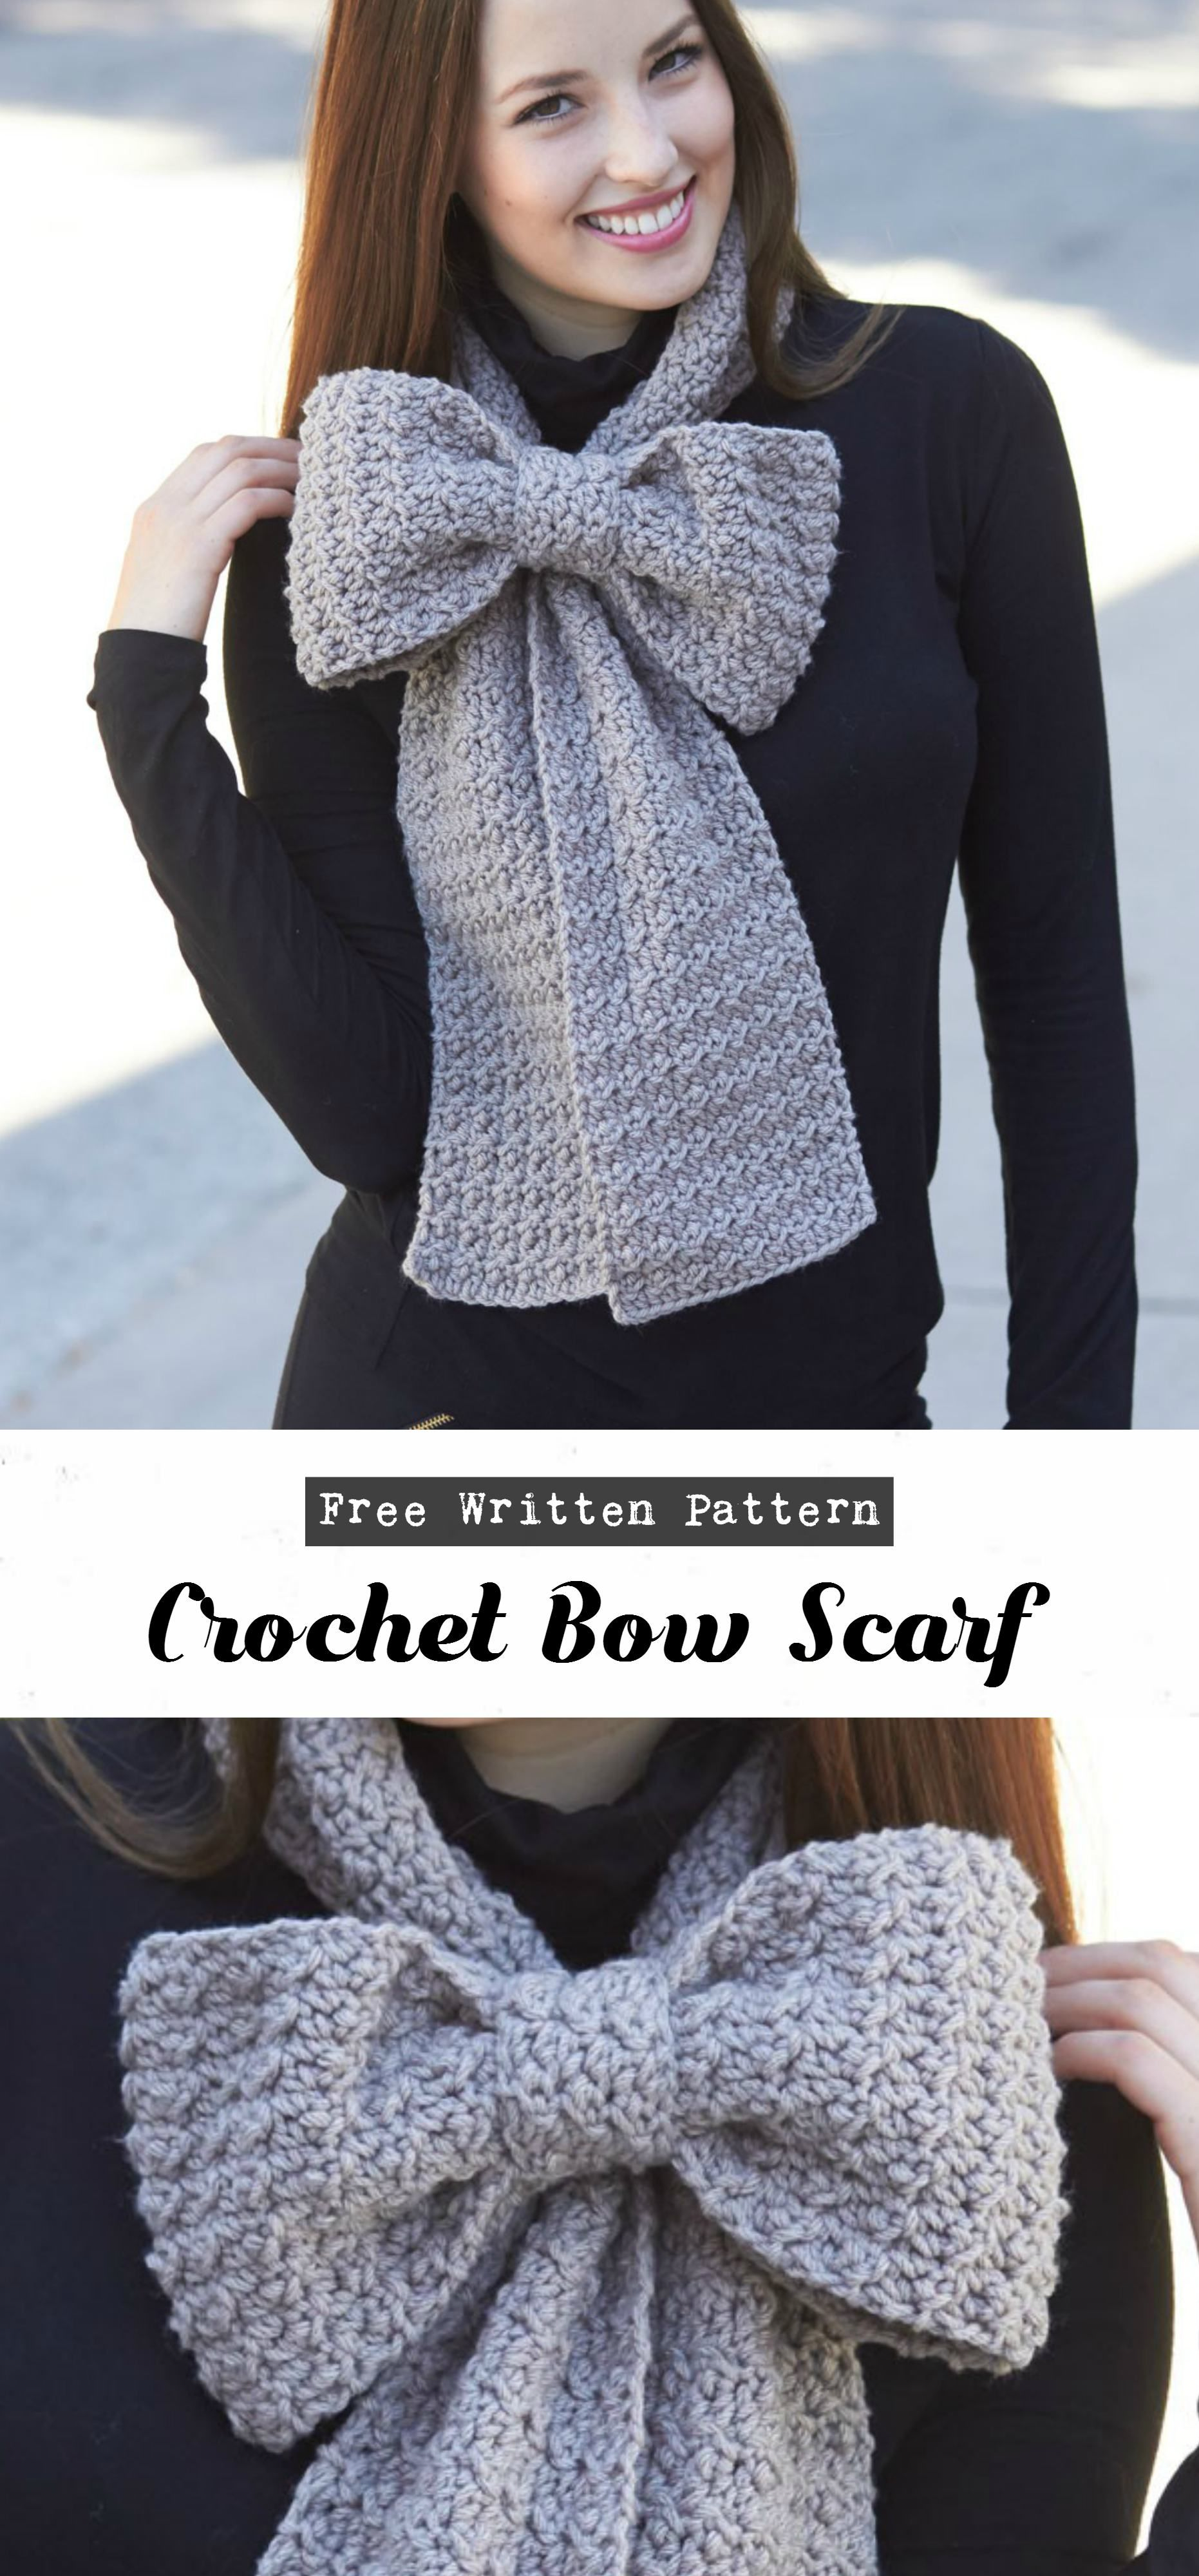 Crochet Bow Scarf | Häkeln